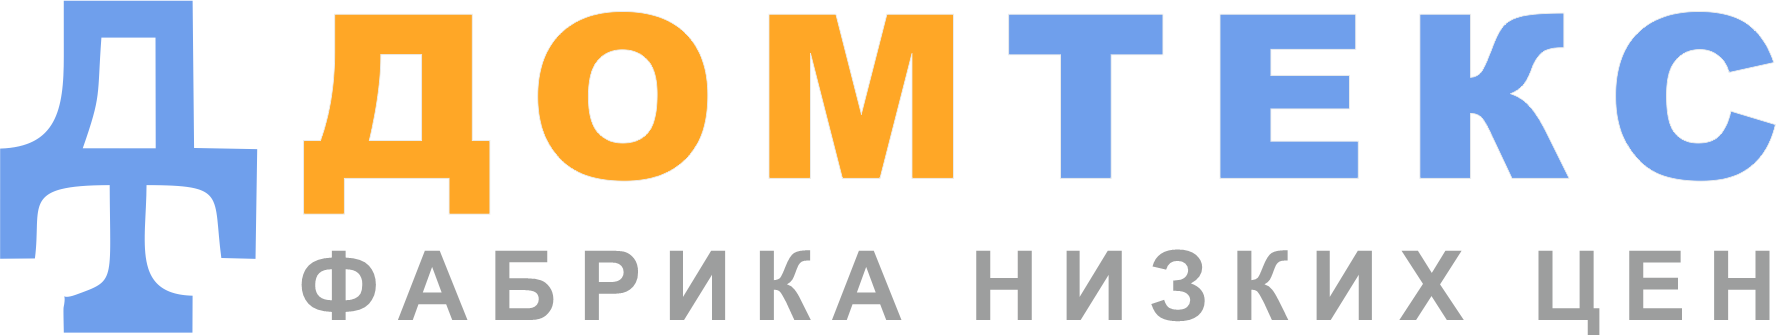 domtex.com.ua